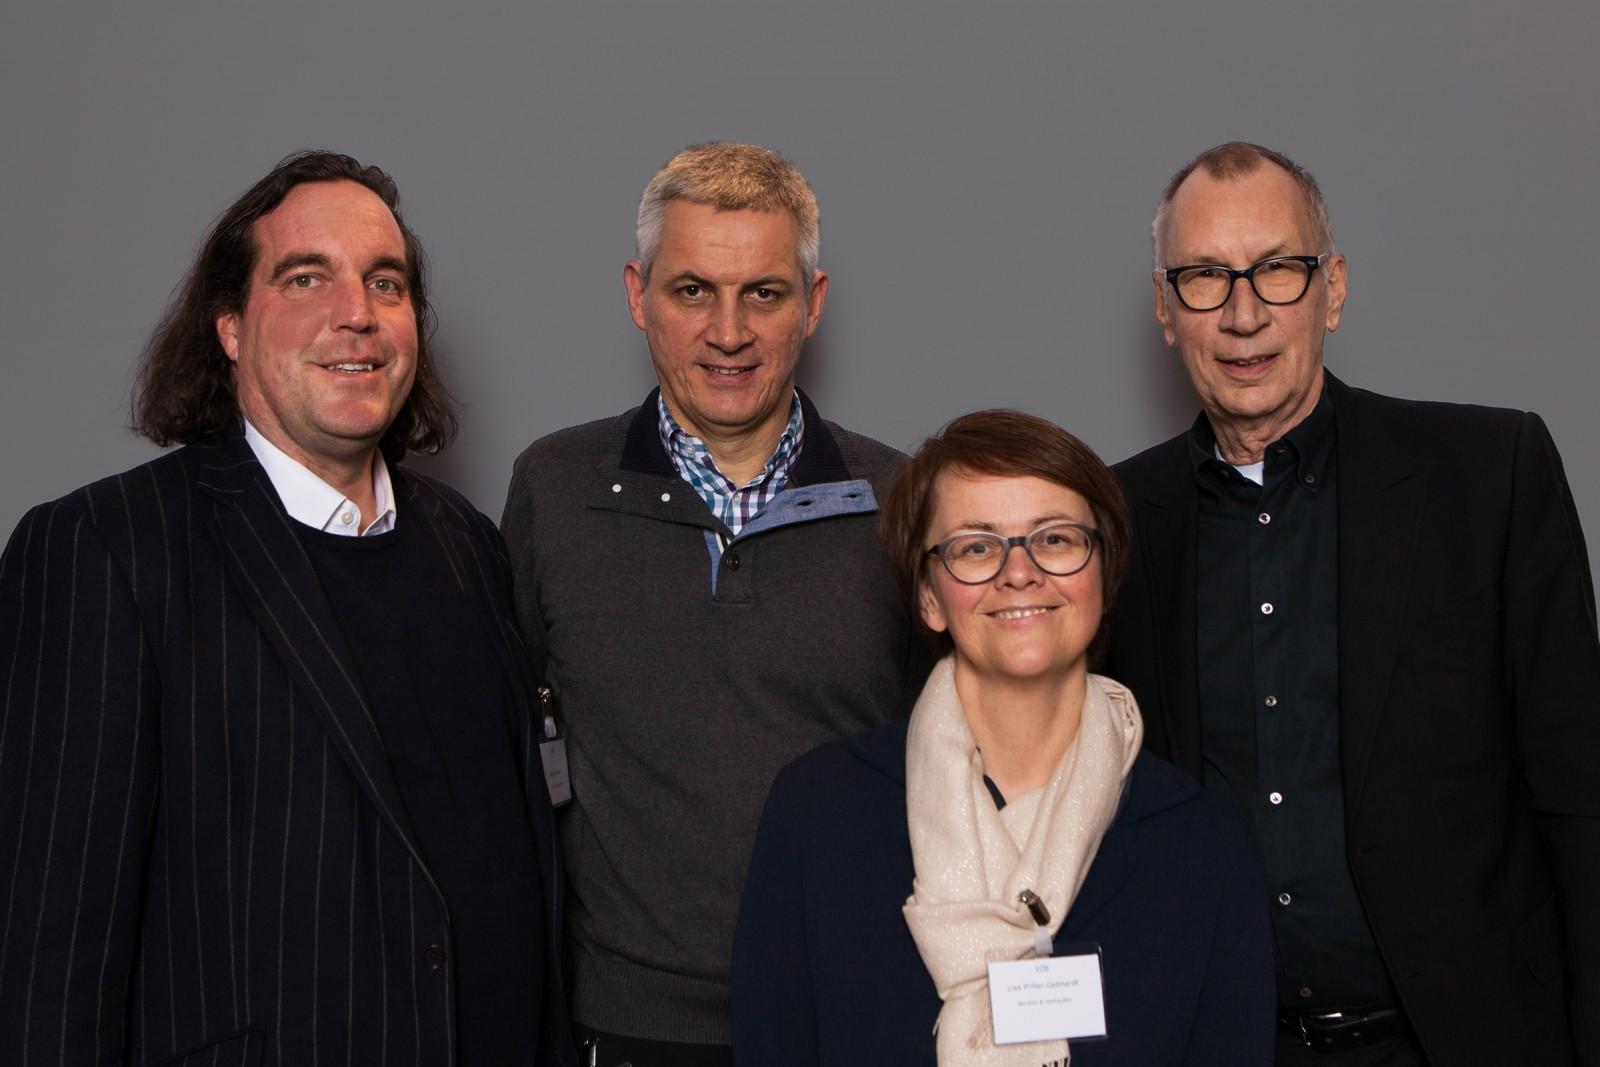 Rupert Sommer, Pressebüro Sommer; Peter Turi, turi2; Lisa Priller-Gebhardt, w&v; Albrecht Hengstenberg, Hengstenberg Medienbeteiligung